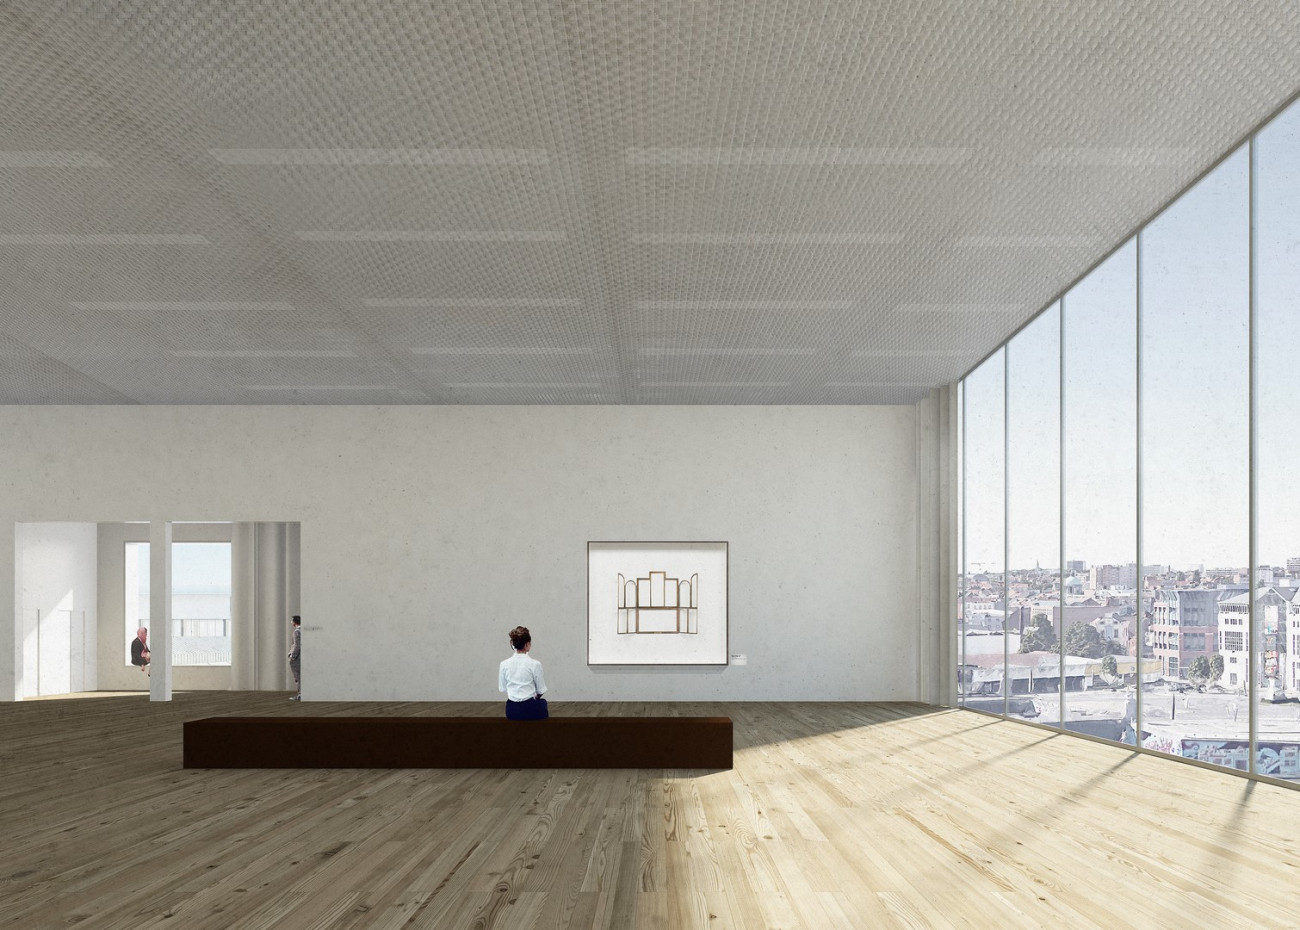 <span class='copyright'>&copy; noAarchitecten, EM2N, Sergison Bates architects</span>